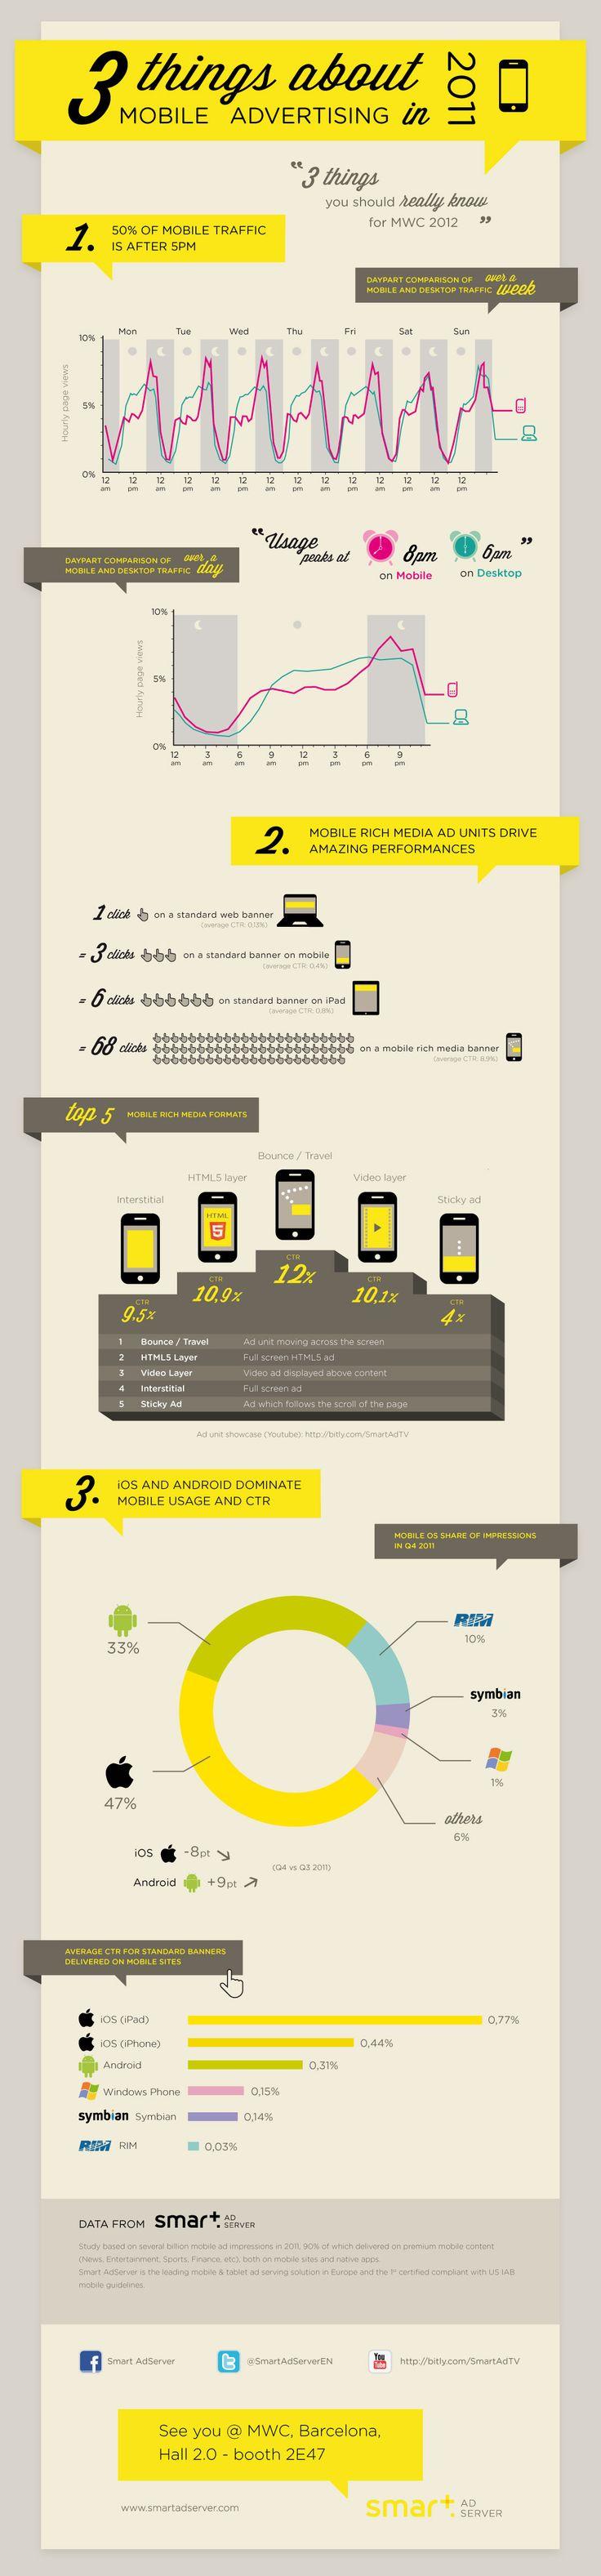 3 mobile things...